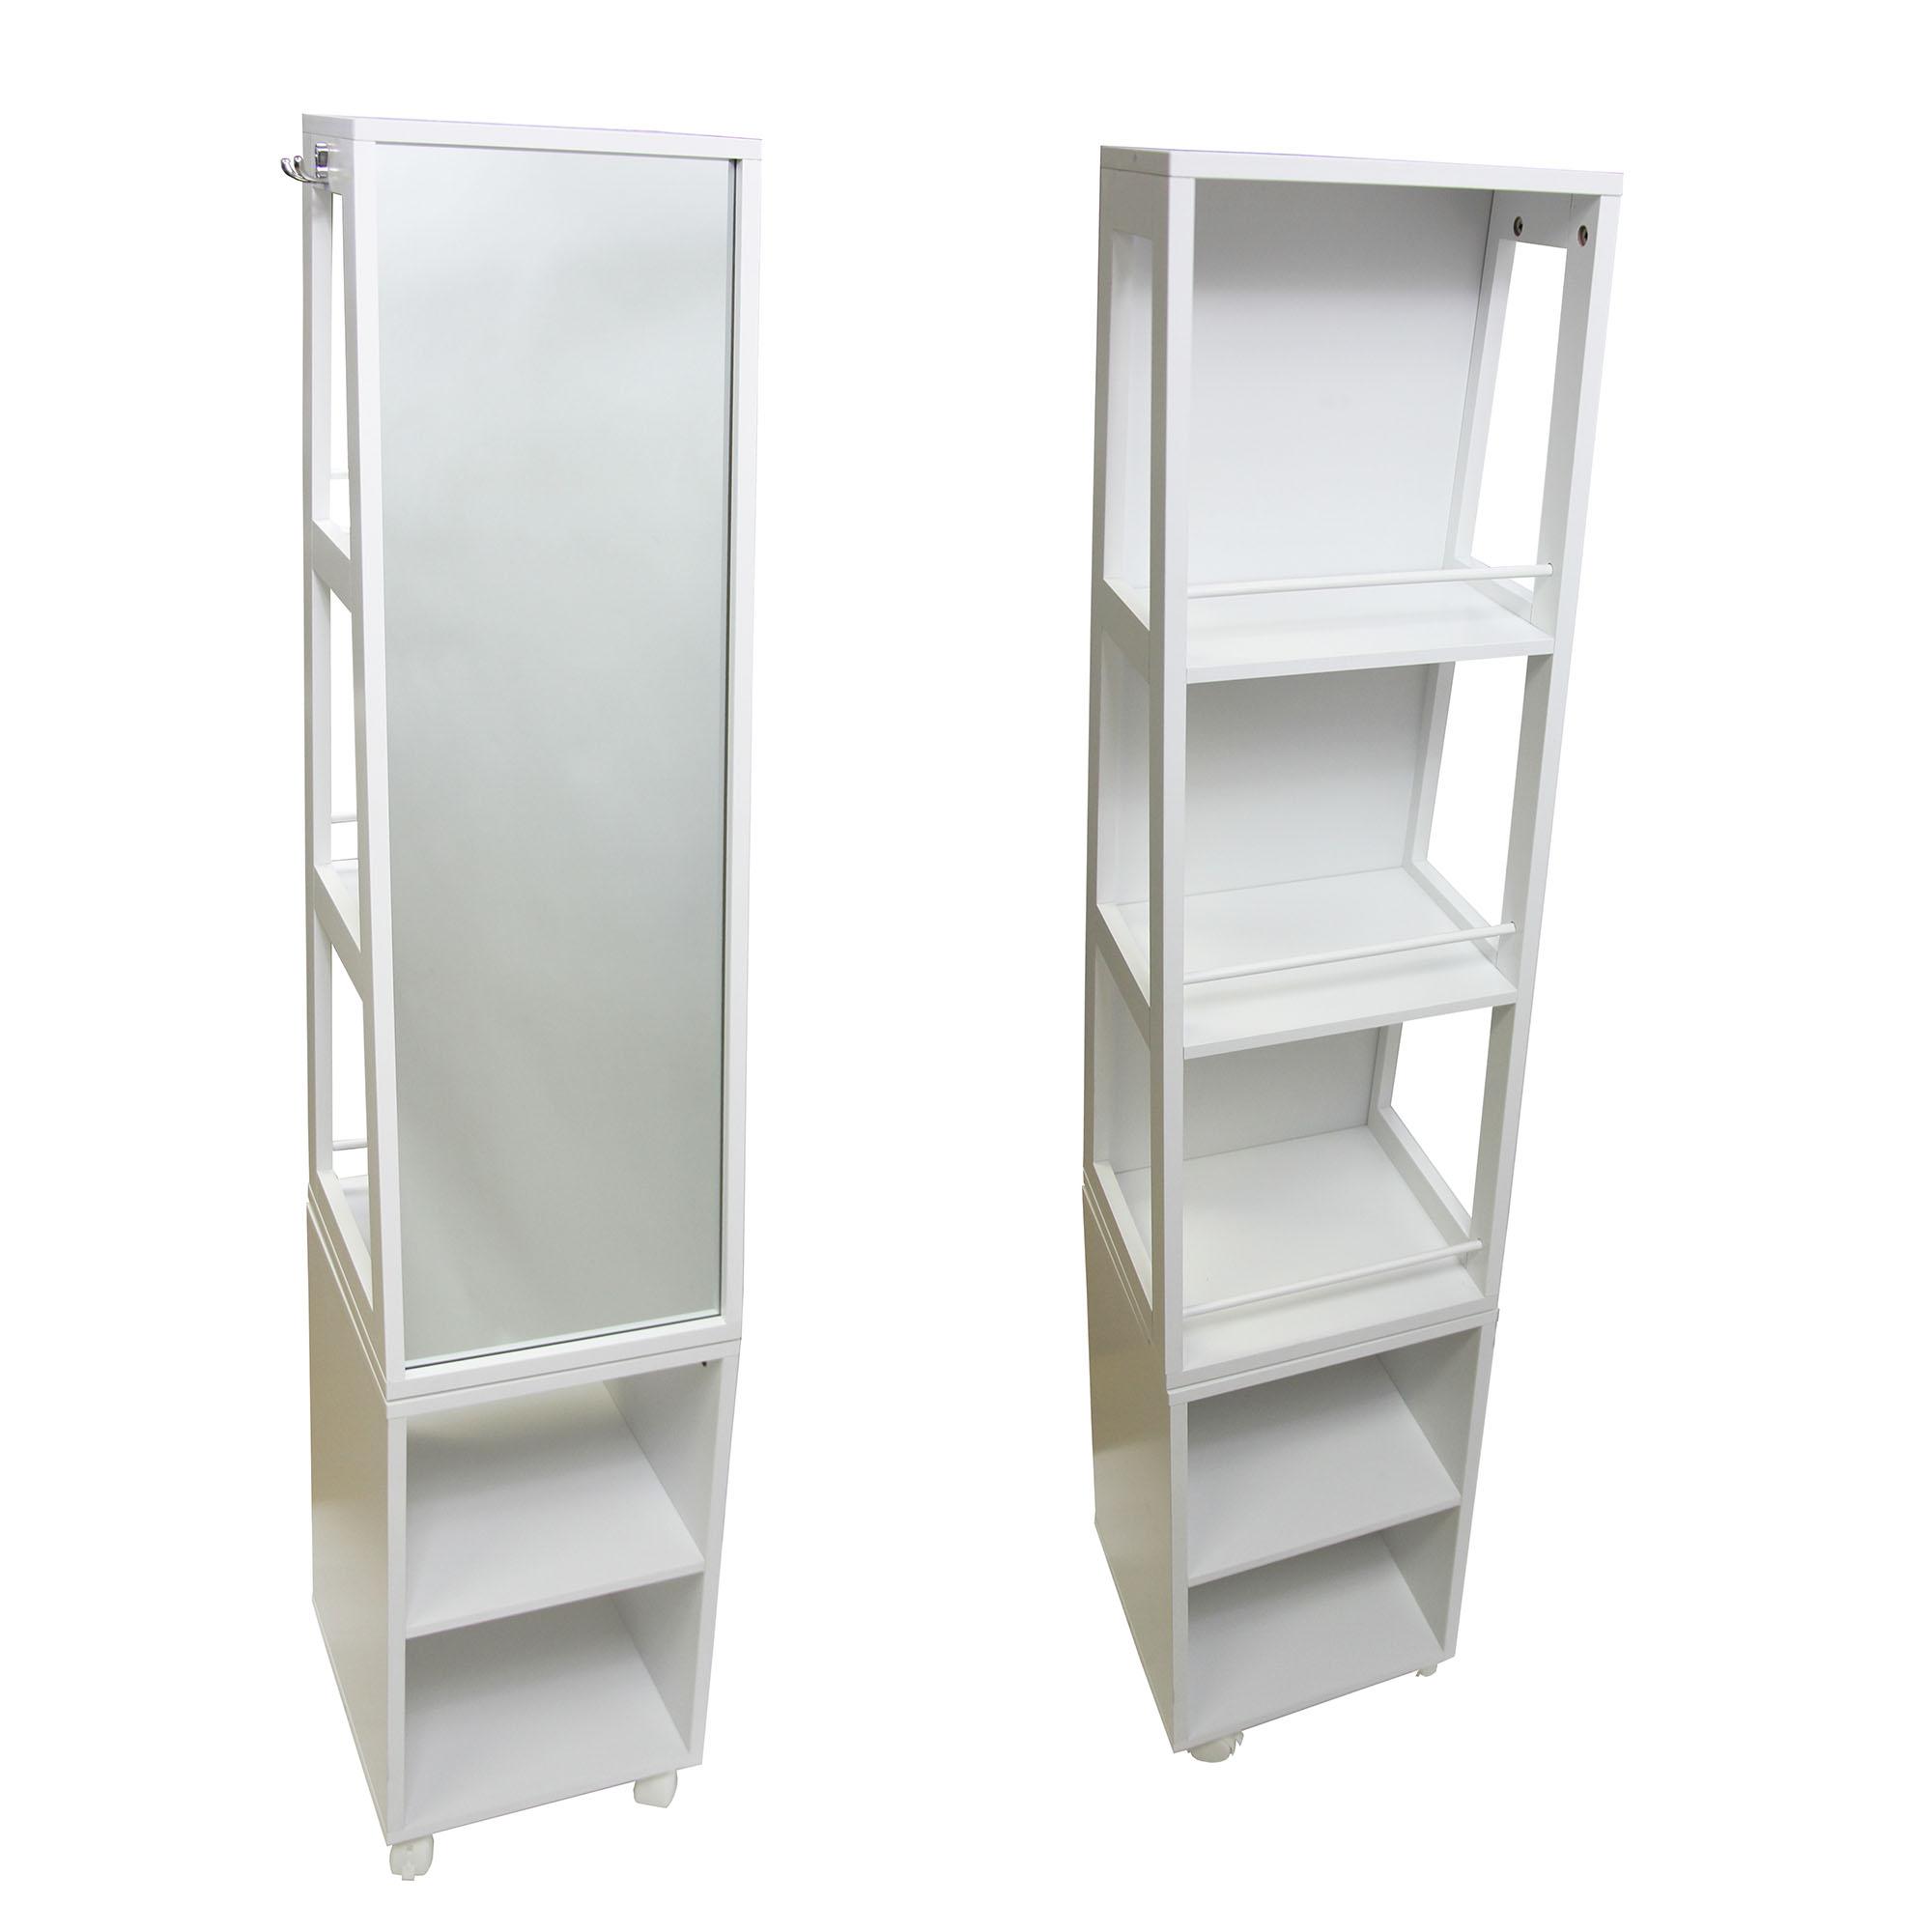 Swivel Storage Tower Cabinet Tall Organizer Linen Mirror 5 Shelves White